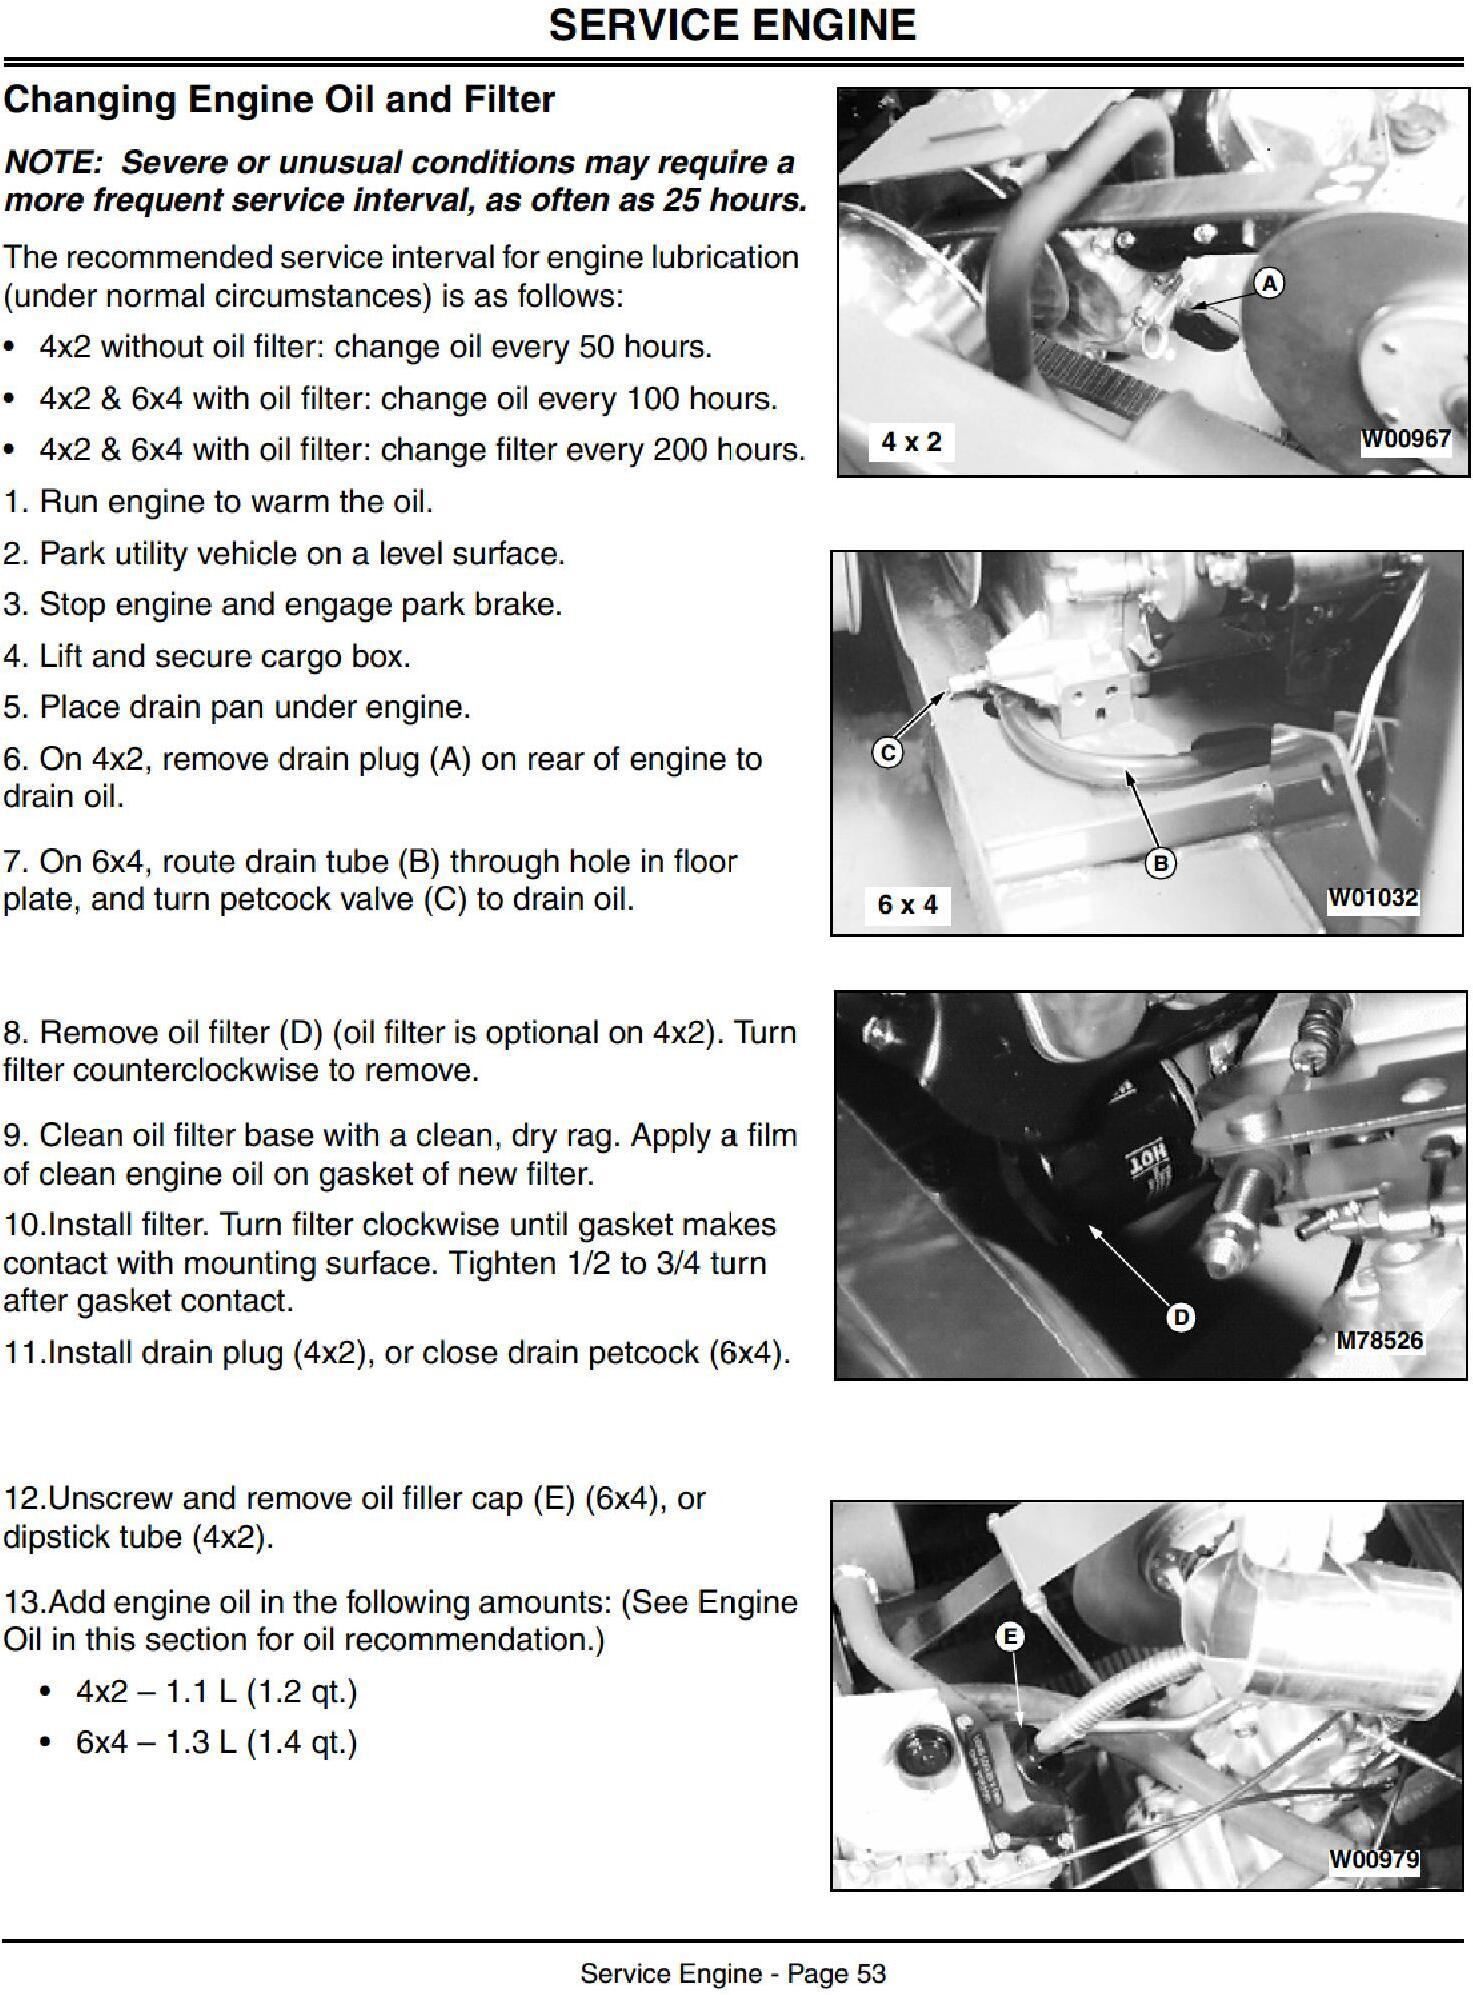 OMM136970 - John Deere 4x2, 6x4 Gator Trail Utility Vehicles Operators Manual - 2